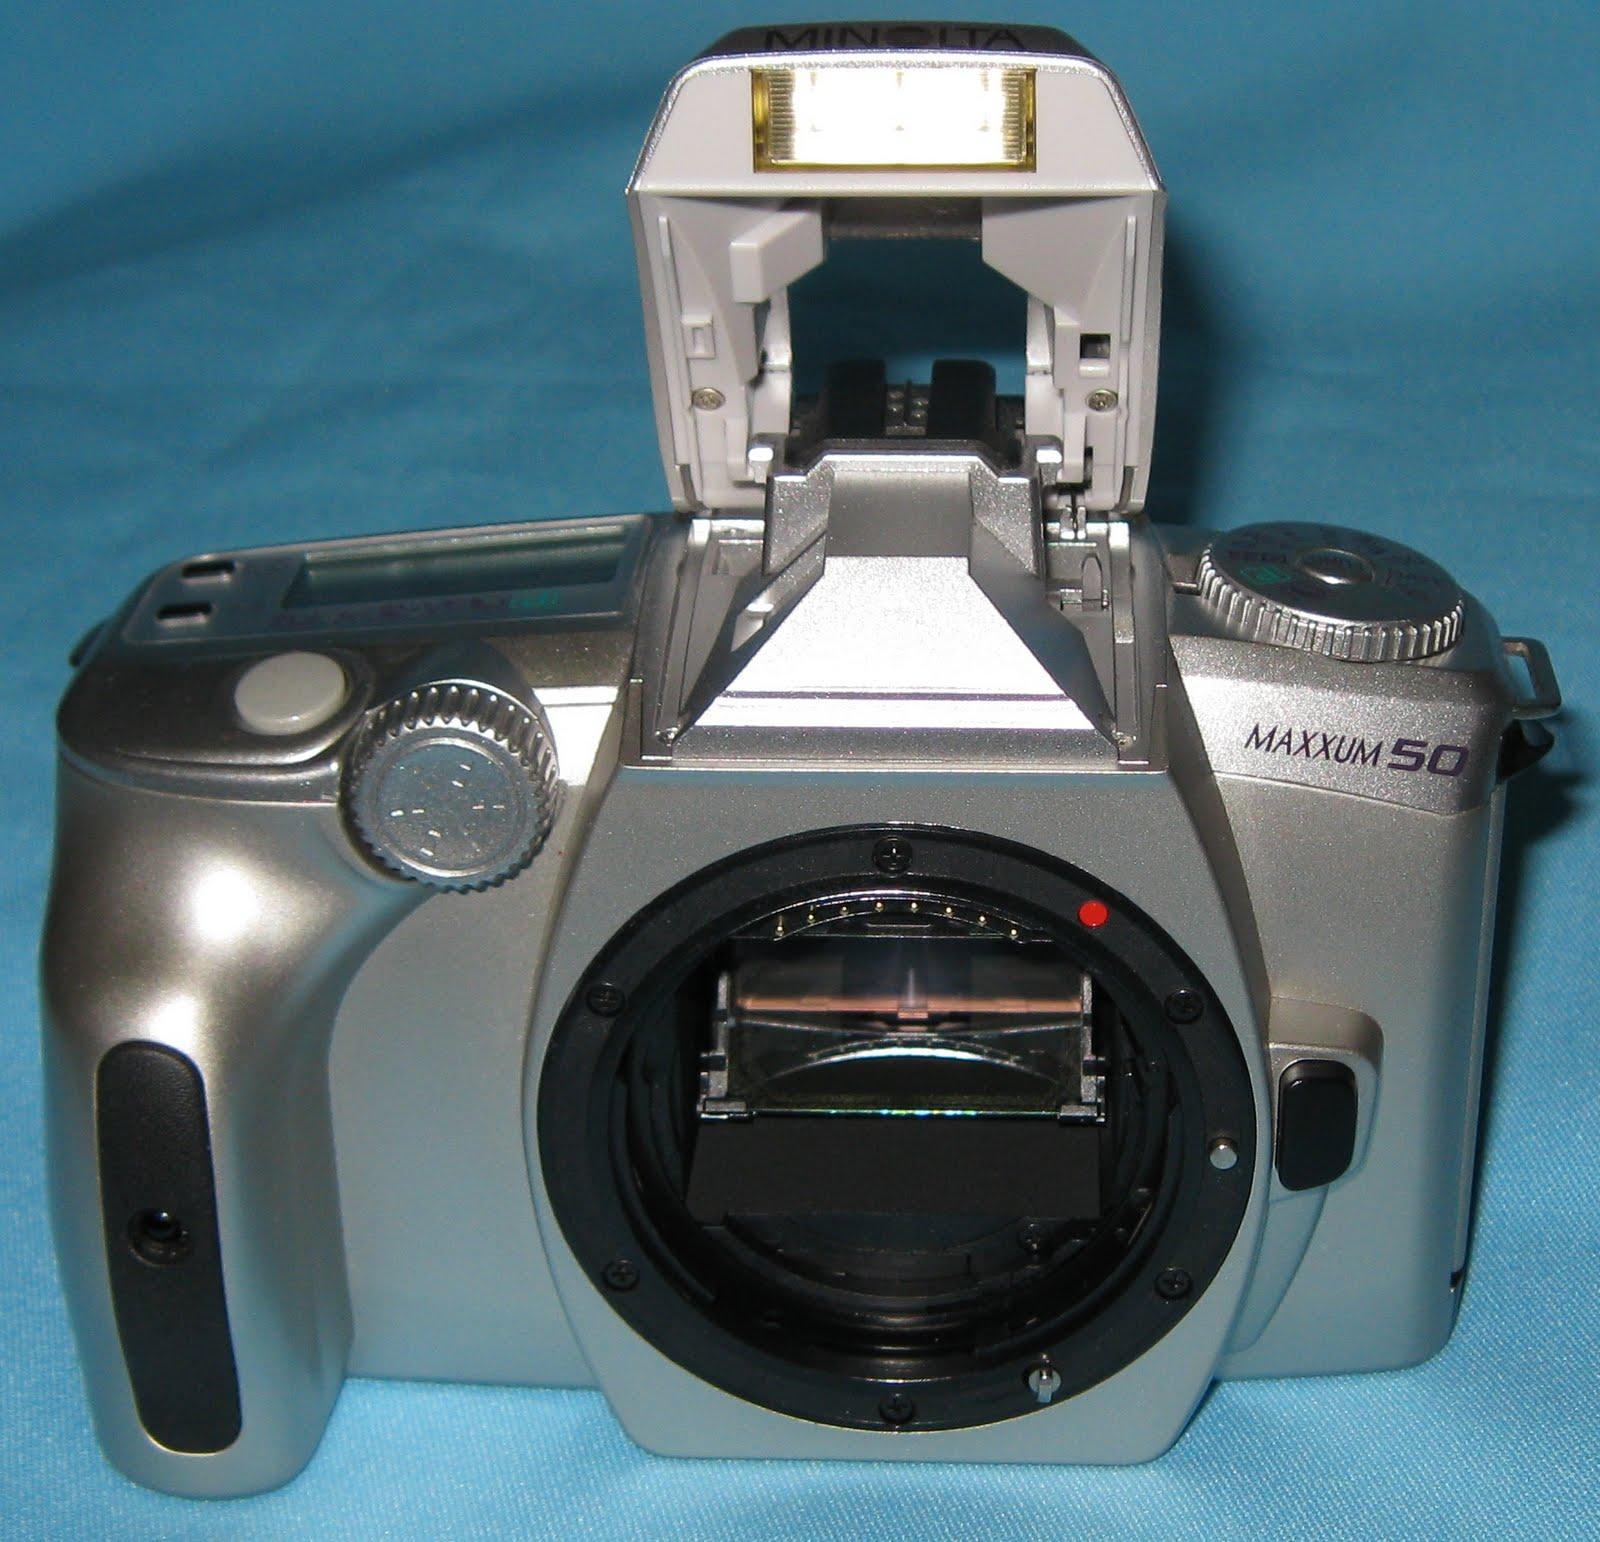 the chens the user s review minolta maxxum 50 slr film camera with rh mailch blogspot com Minolta Maxxum 7000I Minolta Maxxum 7000I